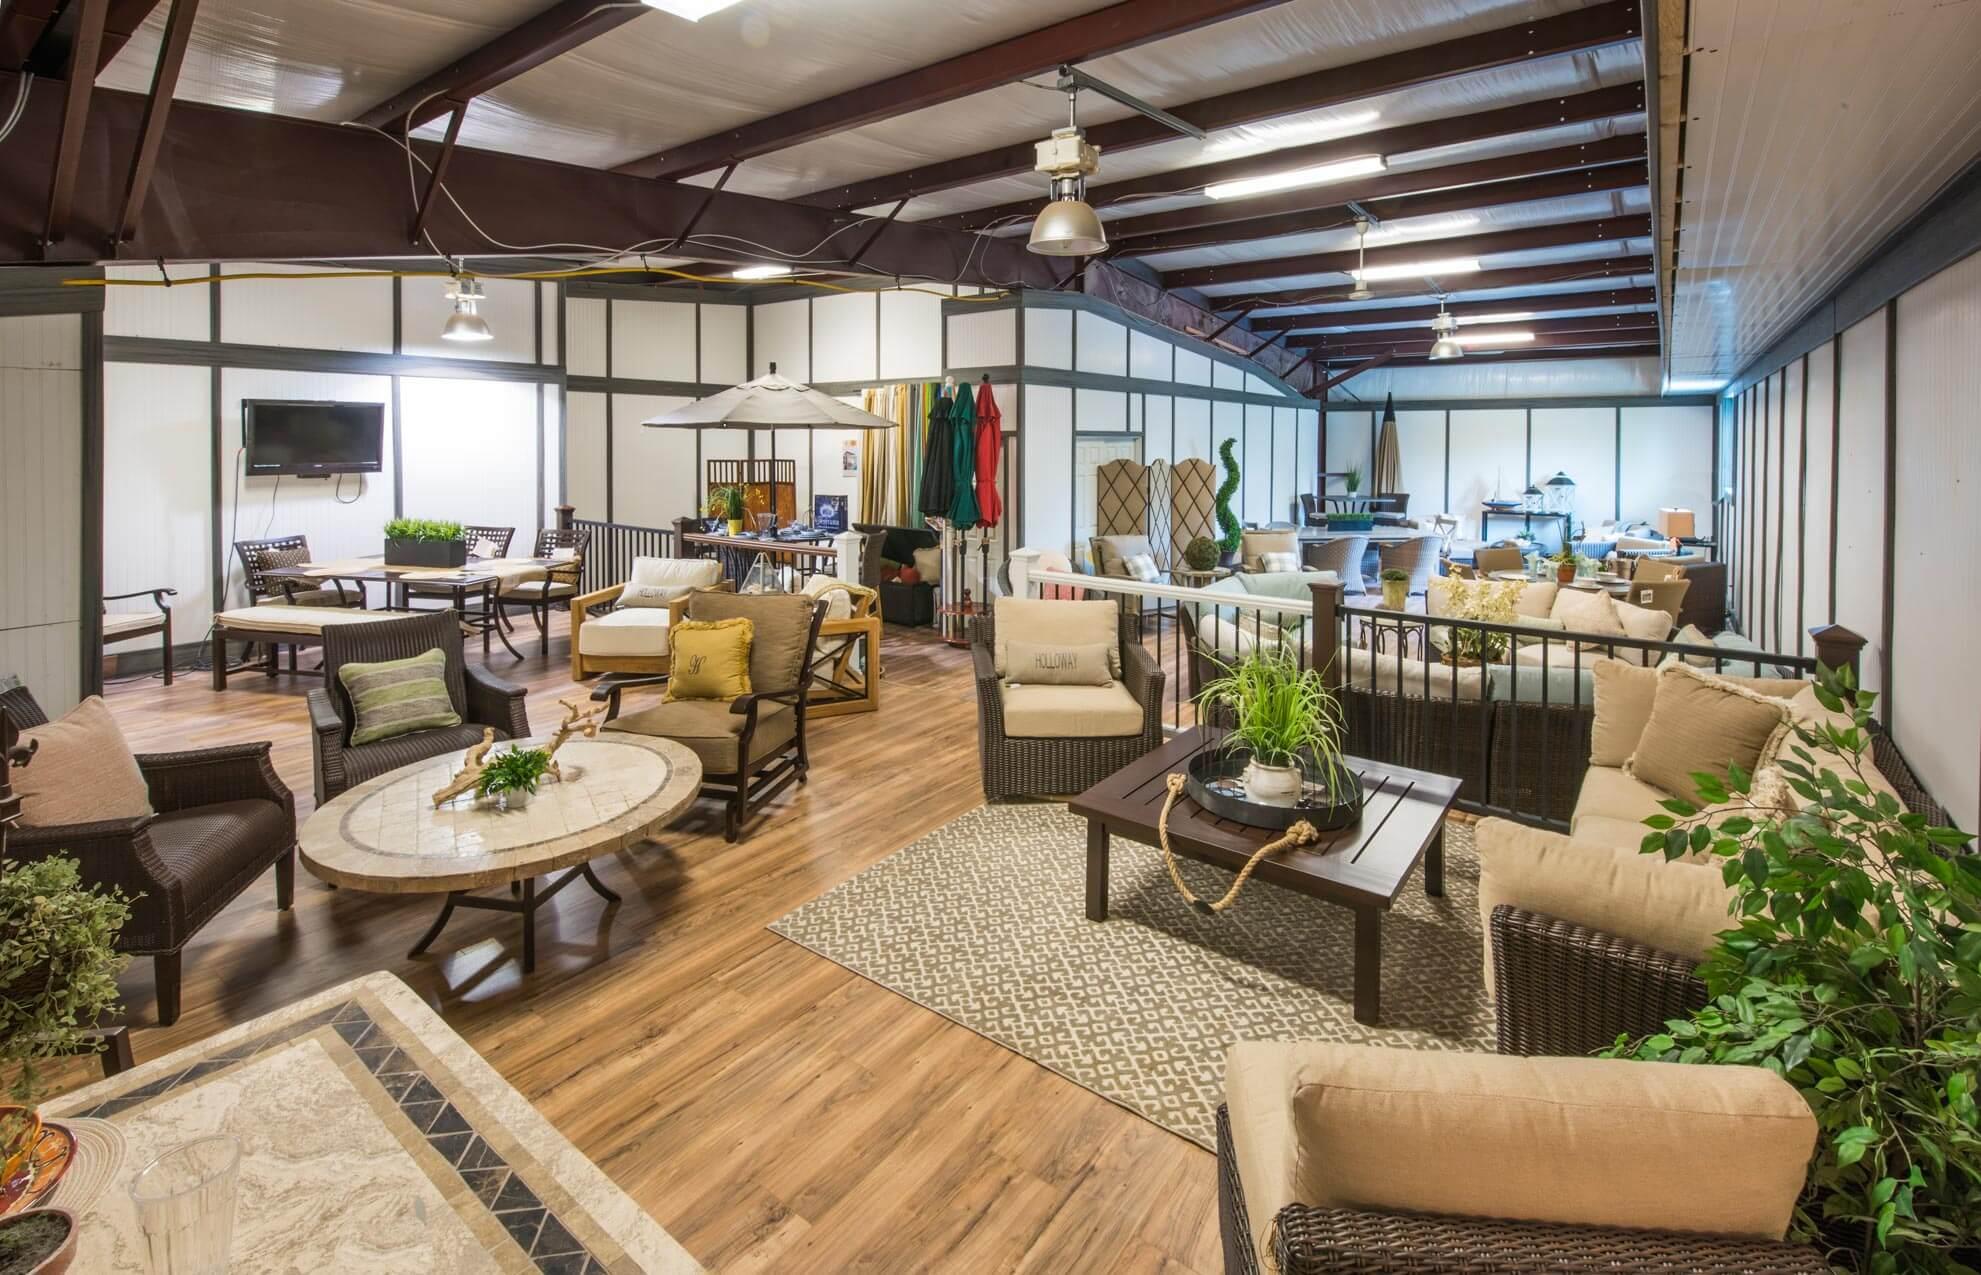 Patio Furniture Grills Hot Tubs Amp More Dulles Va